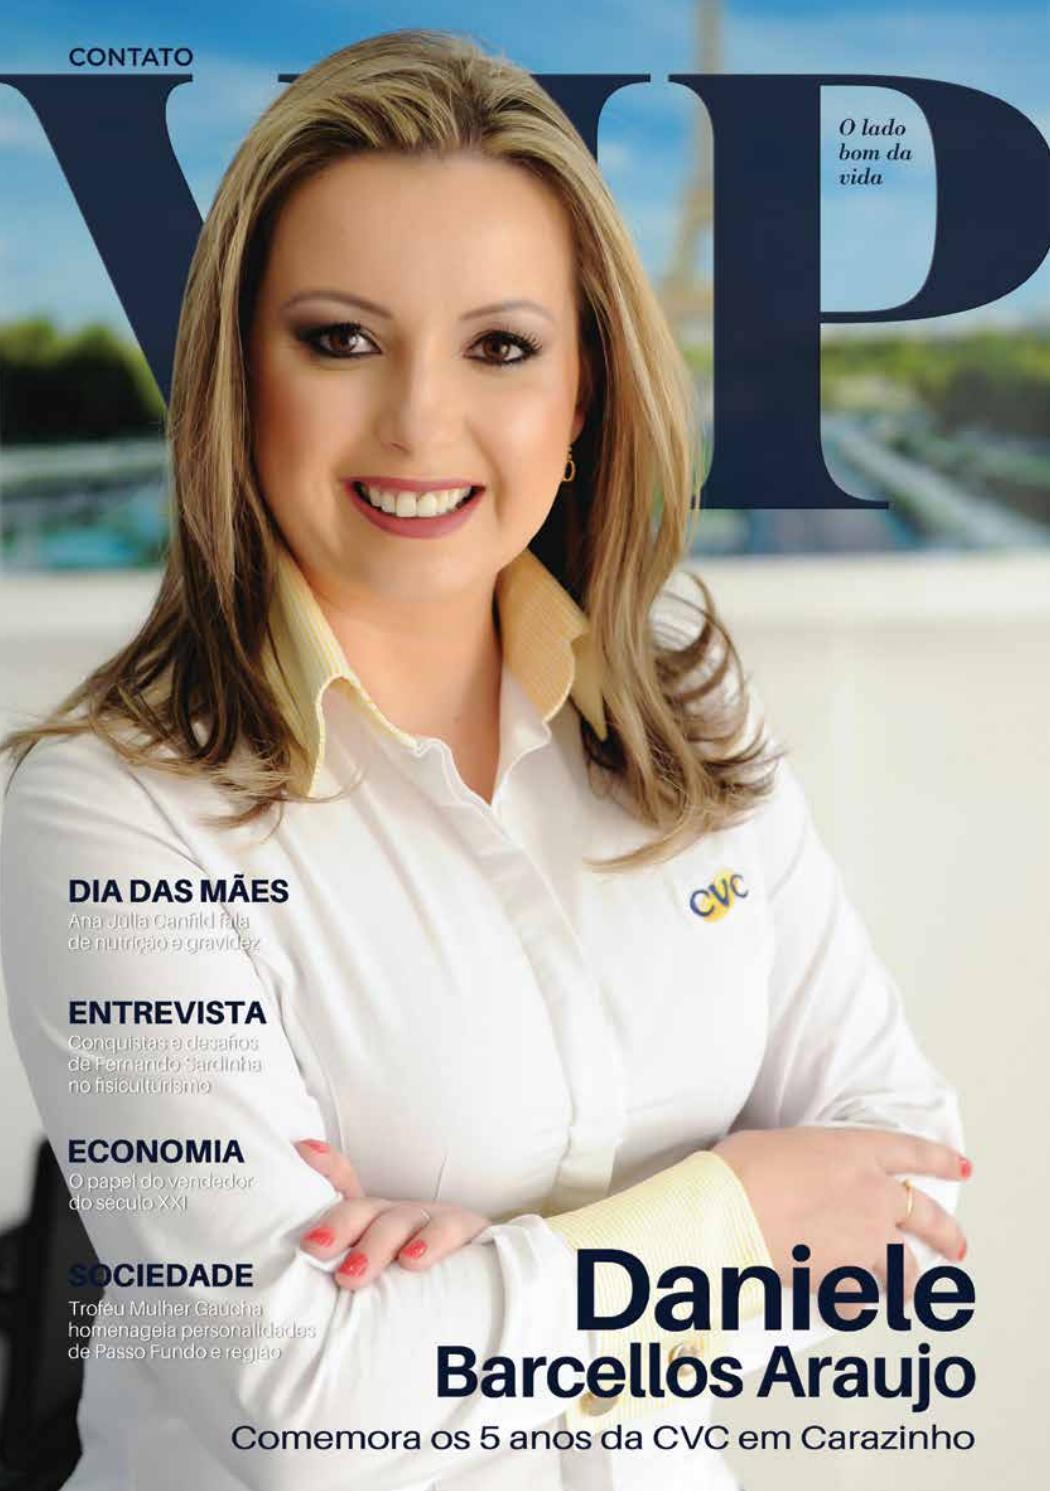 d5054b9976d40 Contato VIP - Maio 2018 - Carazinho by ContatoVIP - issuu